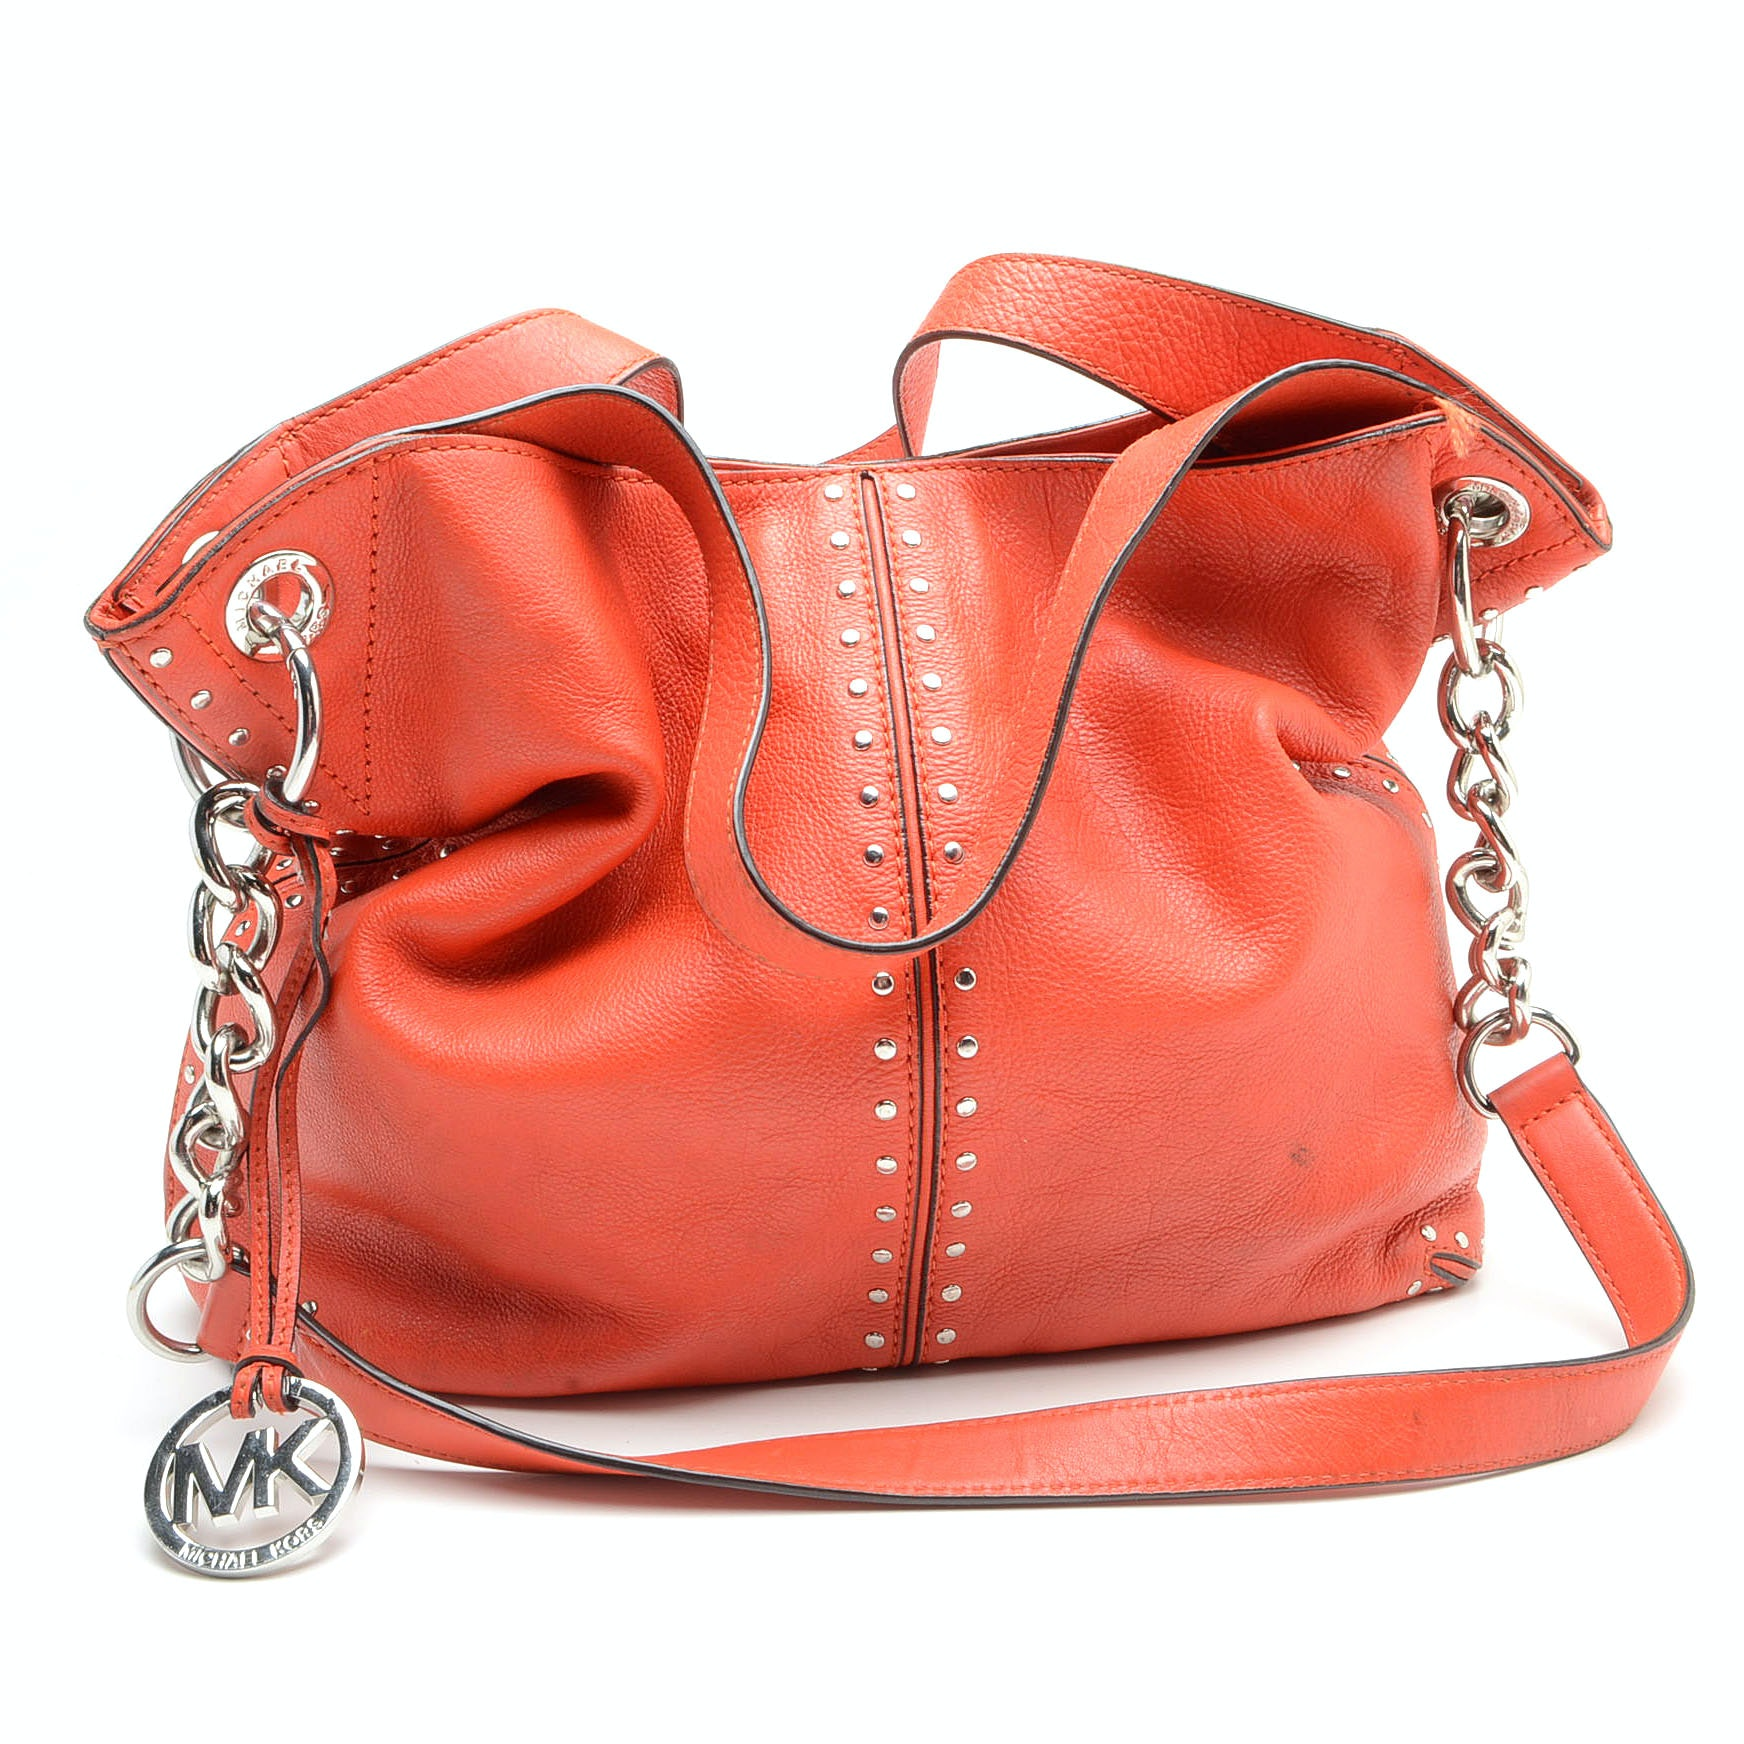 Michael by Michael Kors Red Leather Handbag